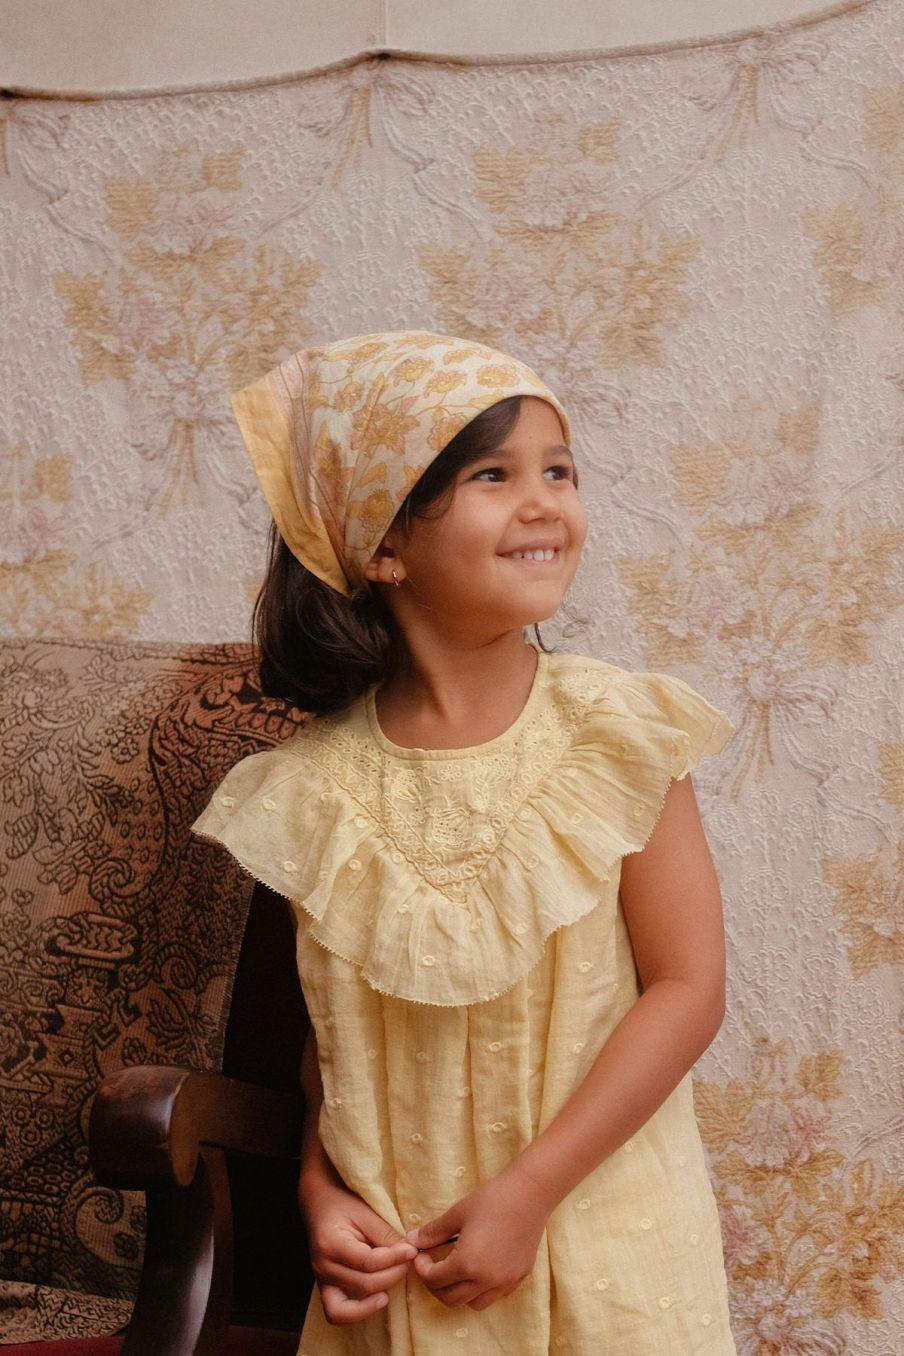 bohemian chic vintage small scarf girl rebha blush flowers